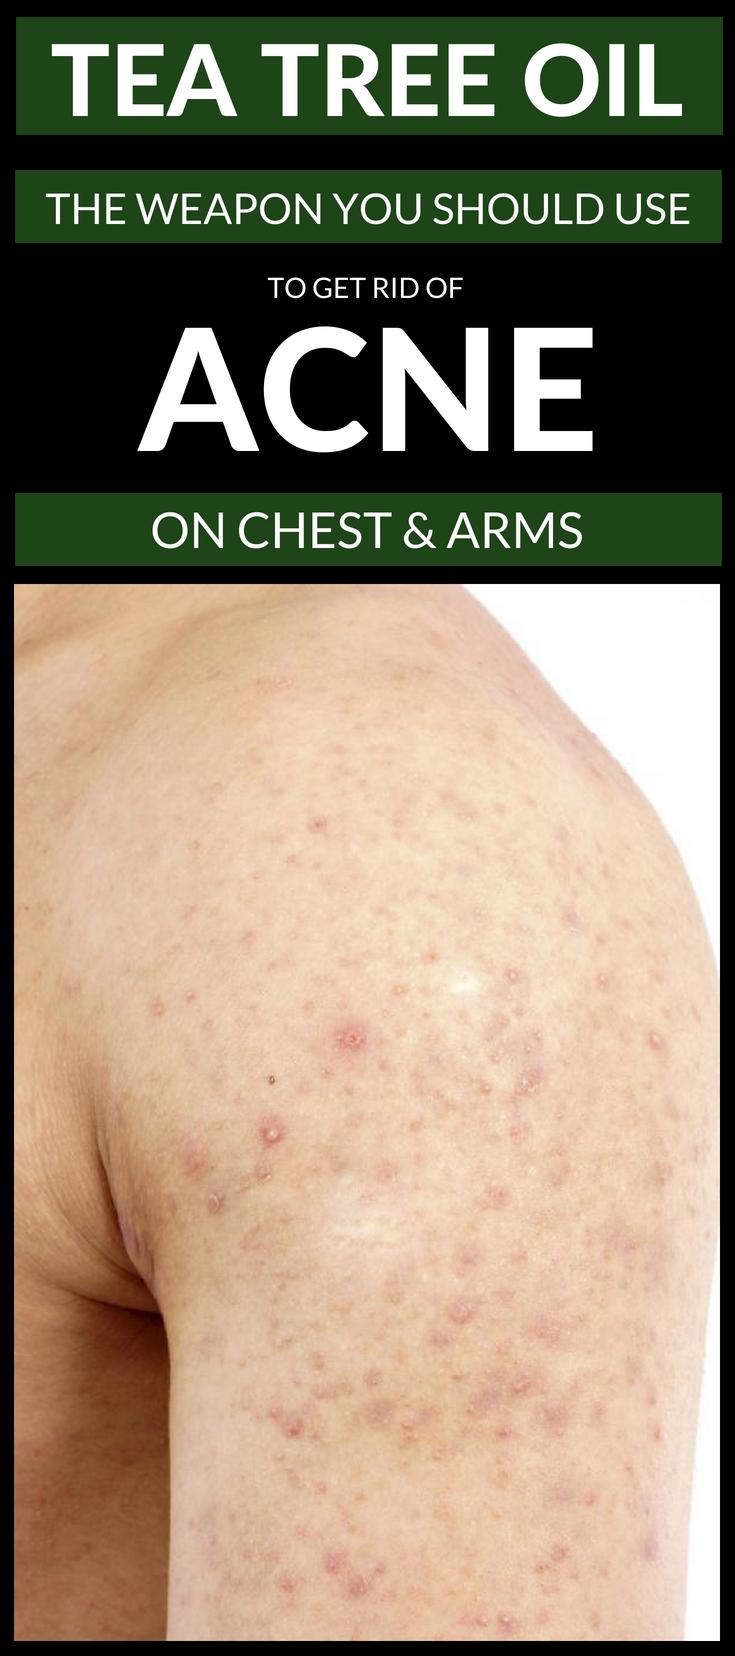 b5d15f6b4f0f381376297435cbf4e095 - How To Get Rid Of Chest Acne And Scars